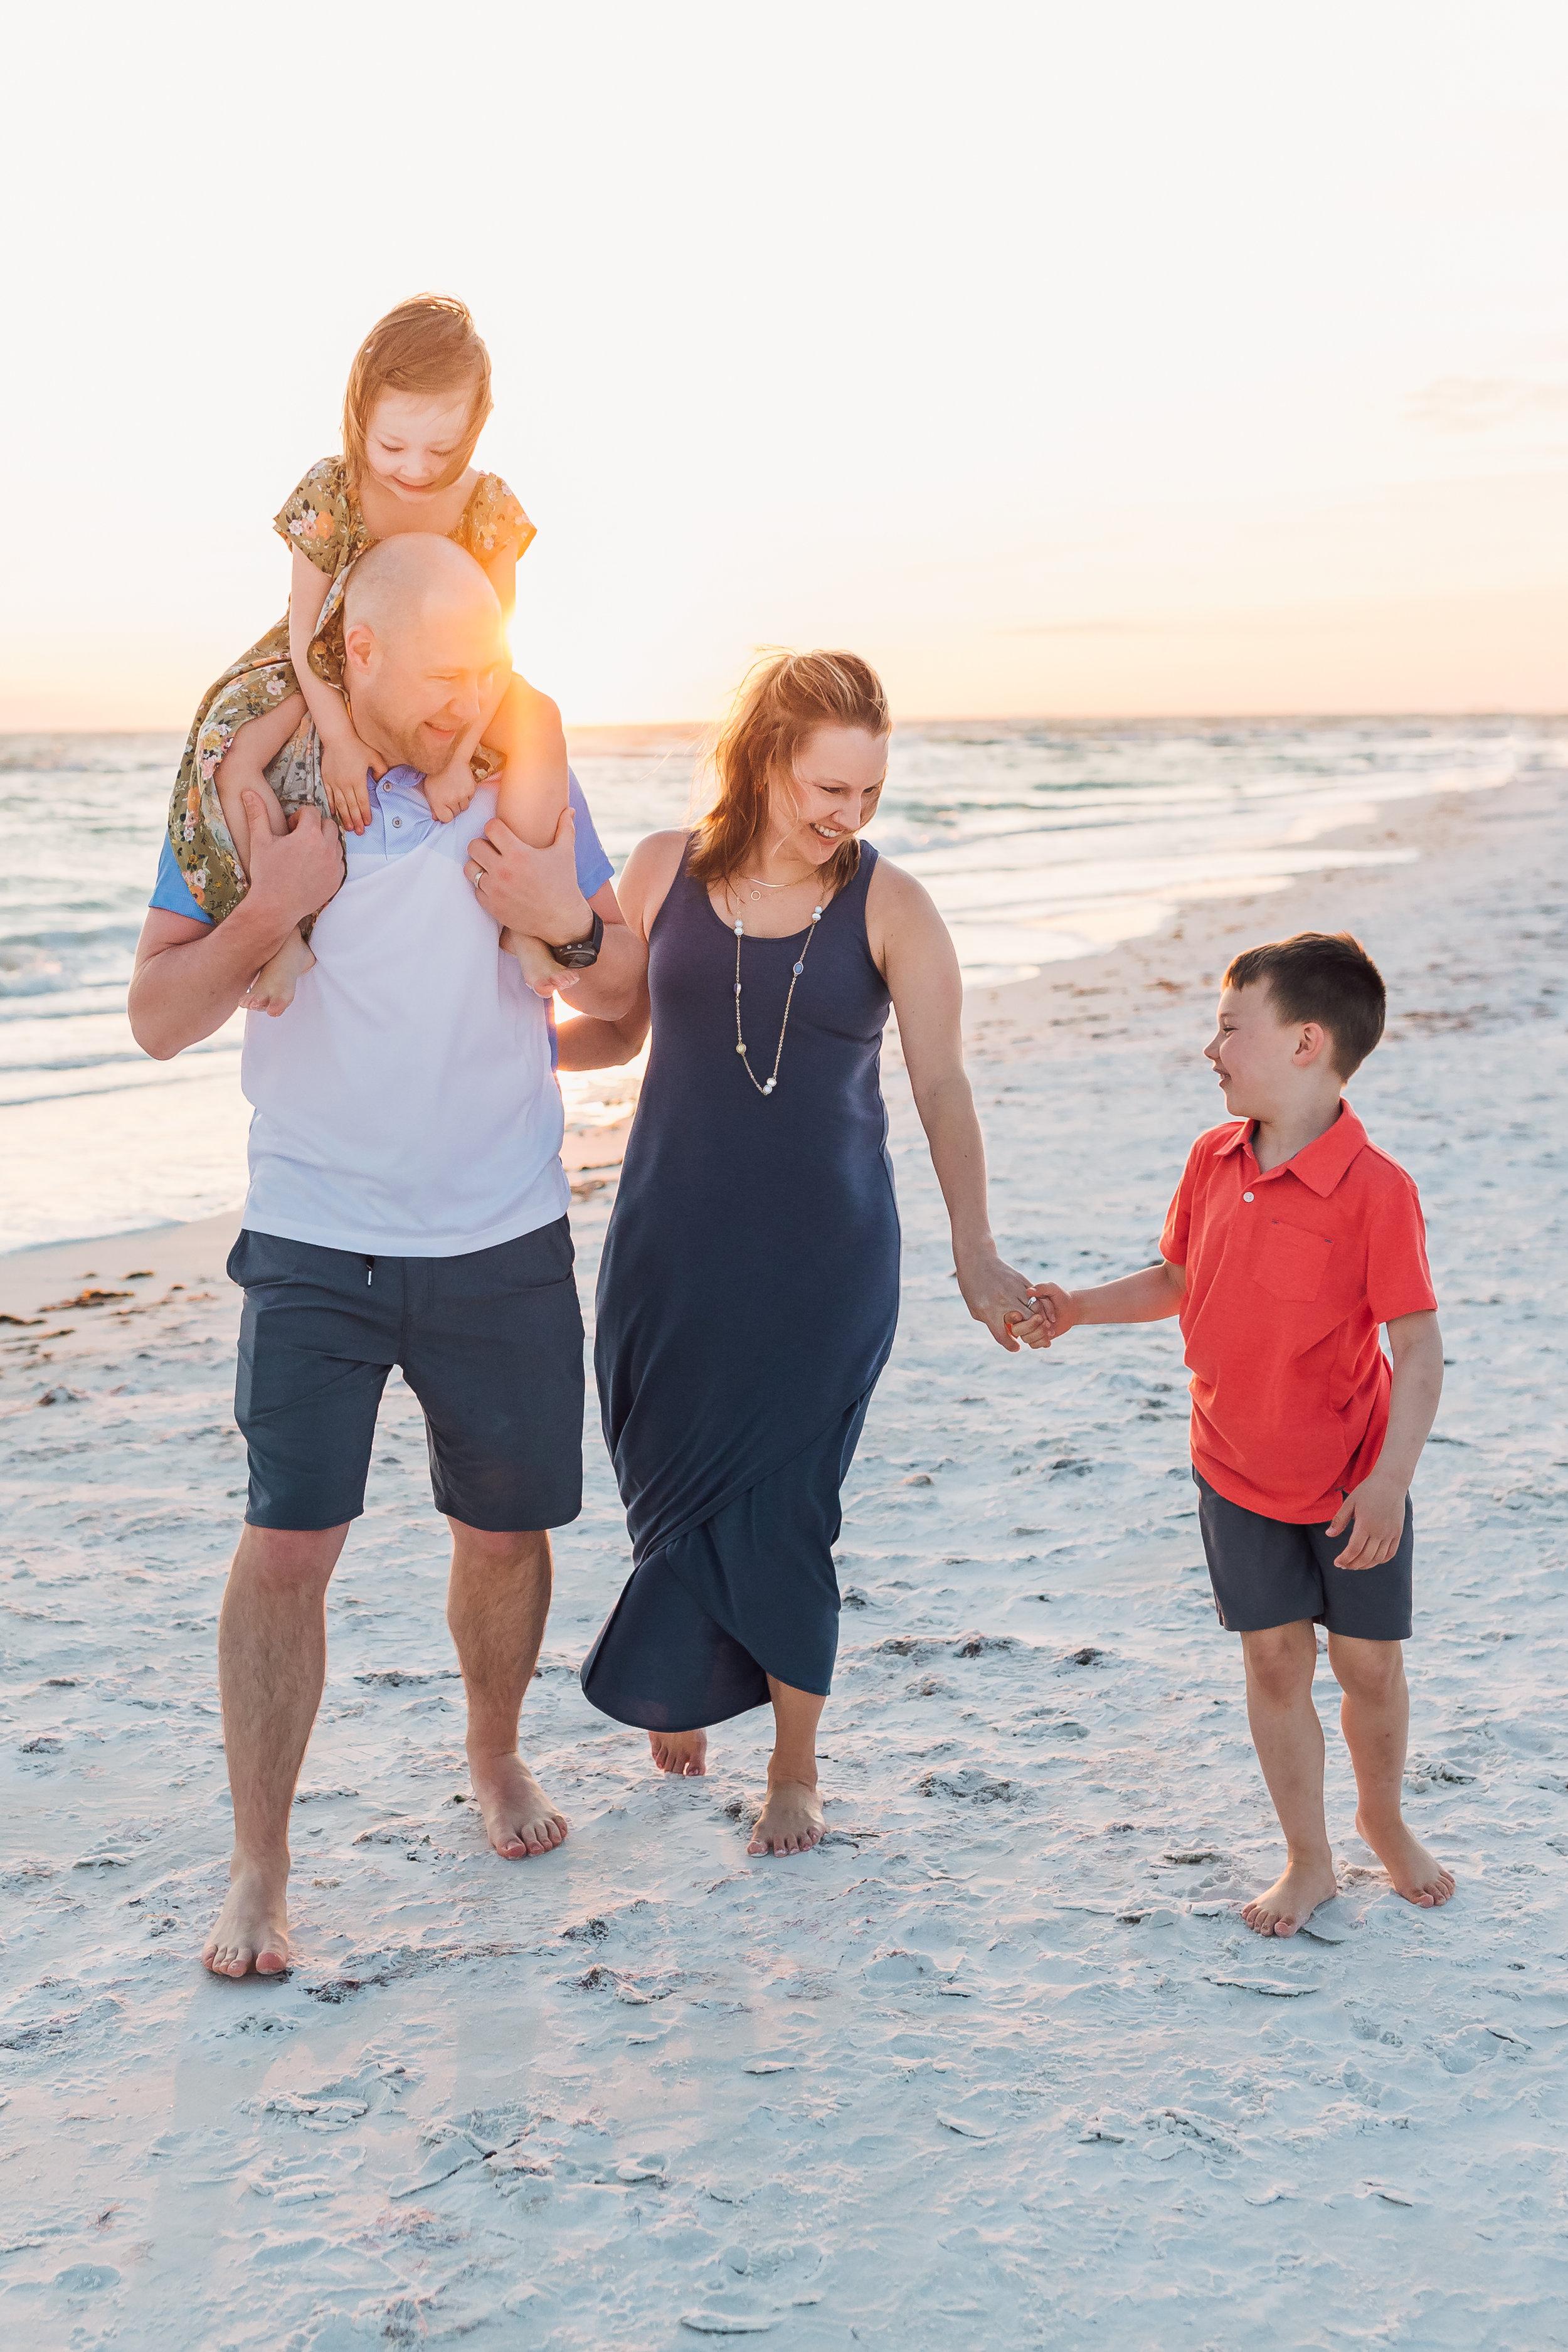 Siesta Key Family Photographer   Siesta Key Photographer   Sarasota Family Photographer   Sarasota Photographer   Siesta Key Beach Photographer   Grace and Fire Photography